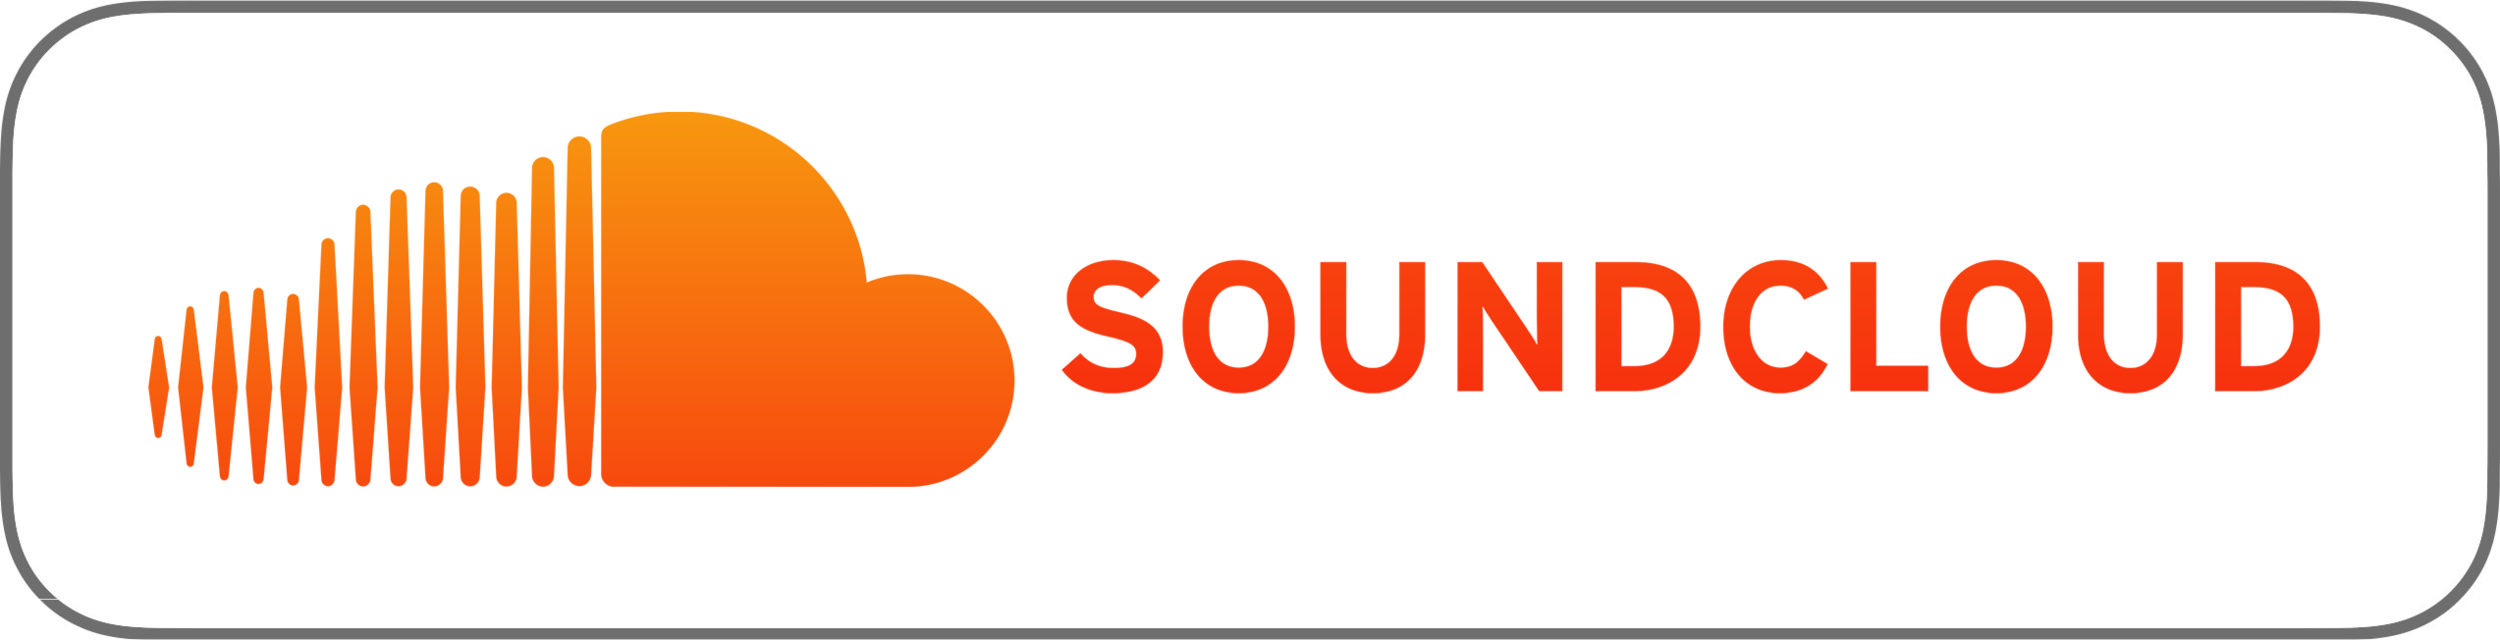 Soundcloud-Podcast-Badge.png